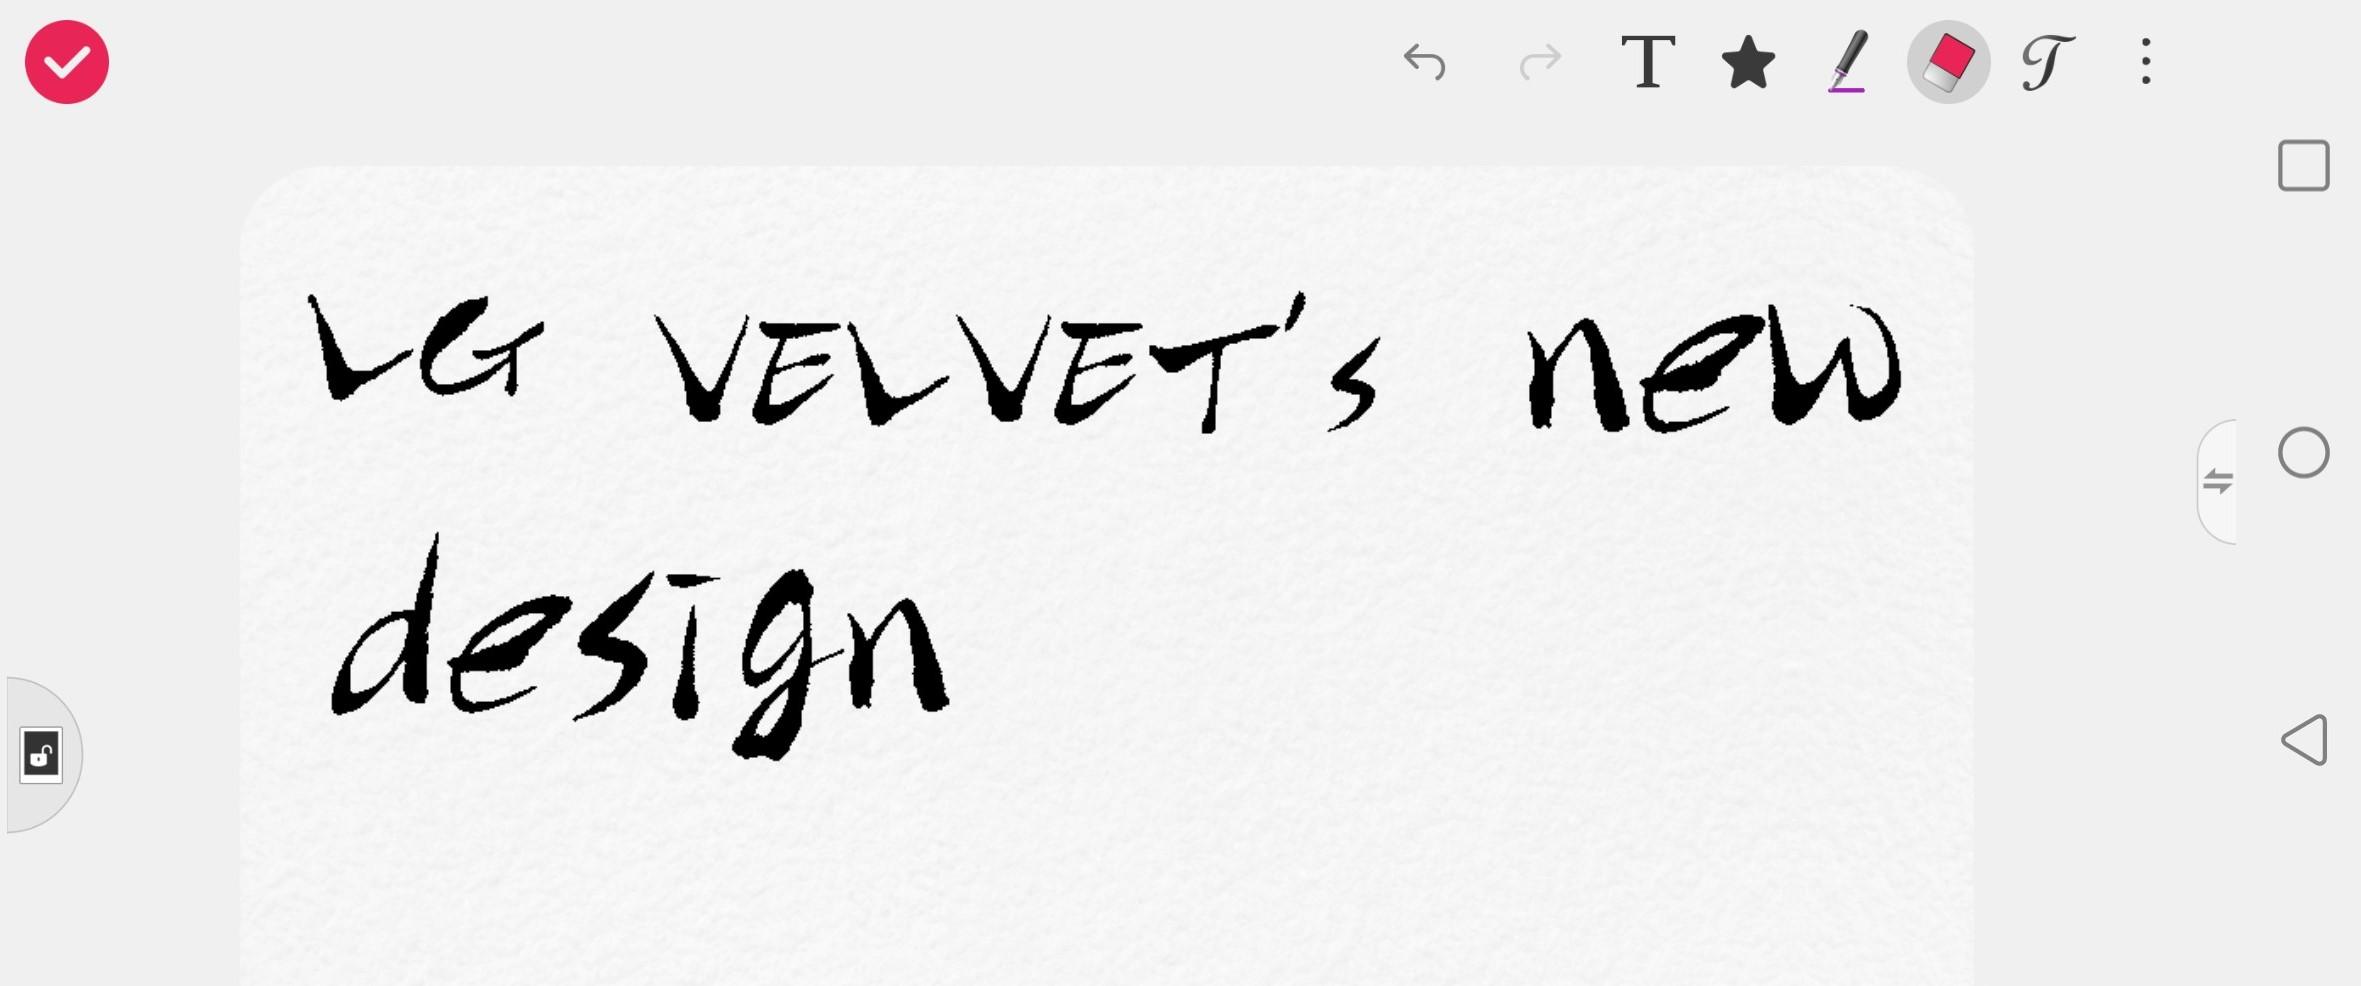 A screenshot from LG VELVET's pre-installed QMemo+ app, with the phrase 'LG VELVET's new design' written down with the active pen